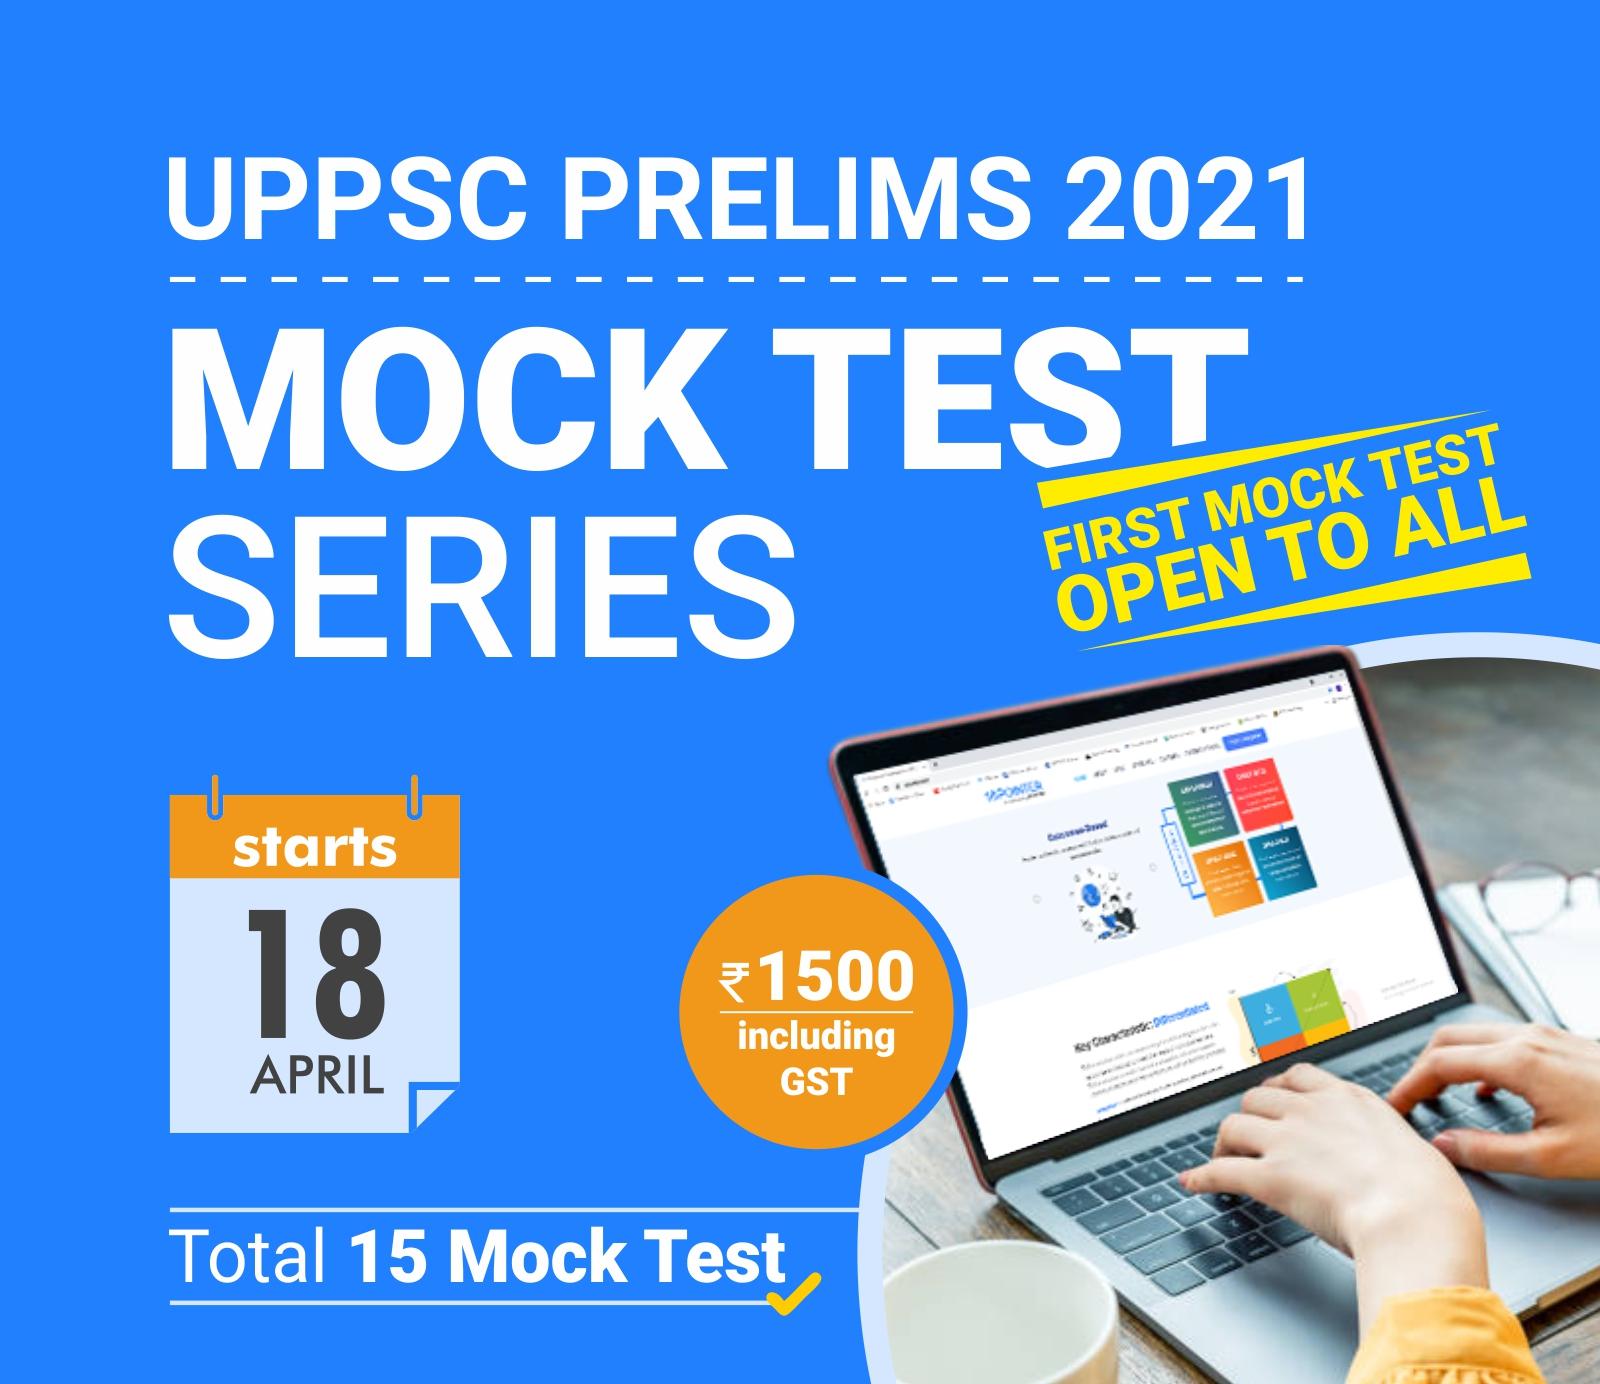 UPPSC Prelims Mock Test Series 2021